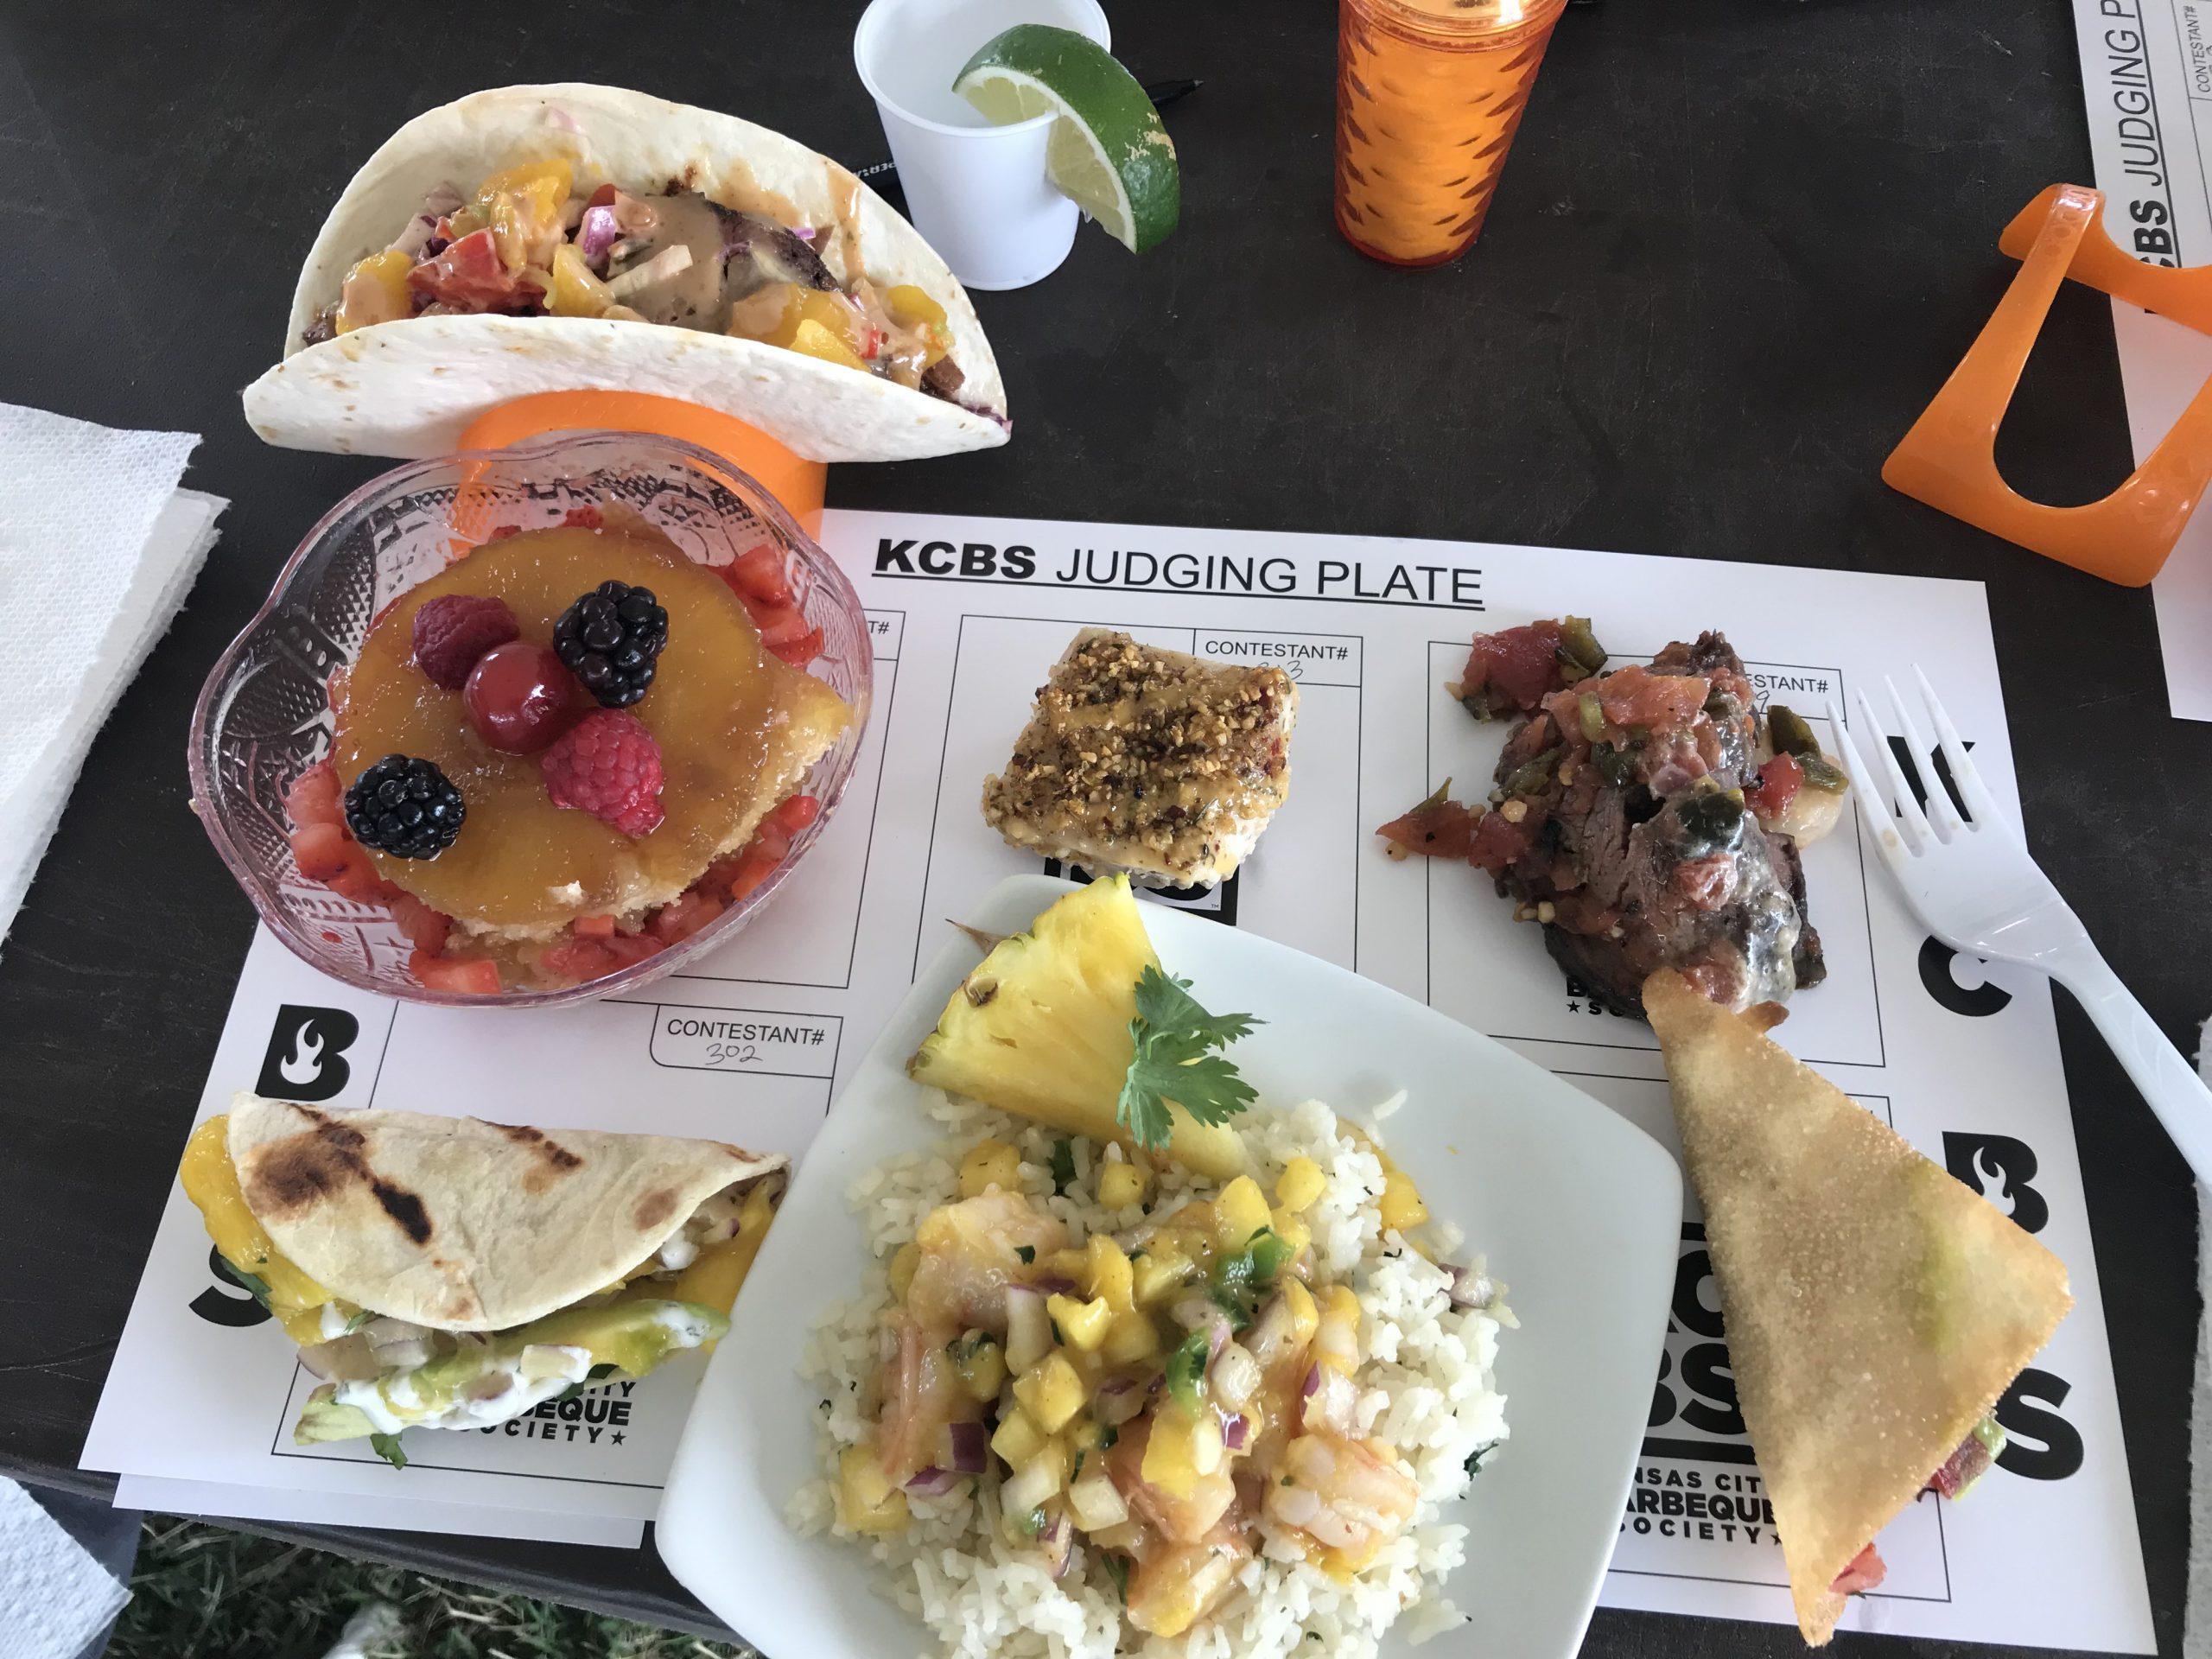 Cabo Infused judges platter